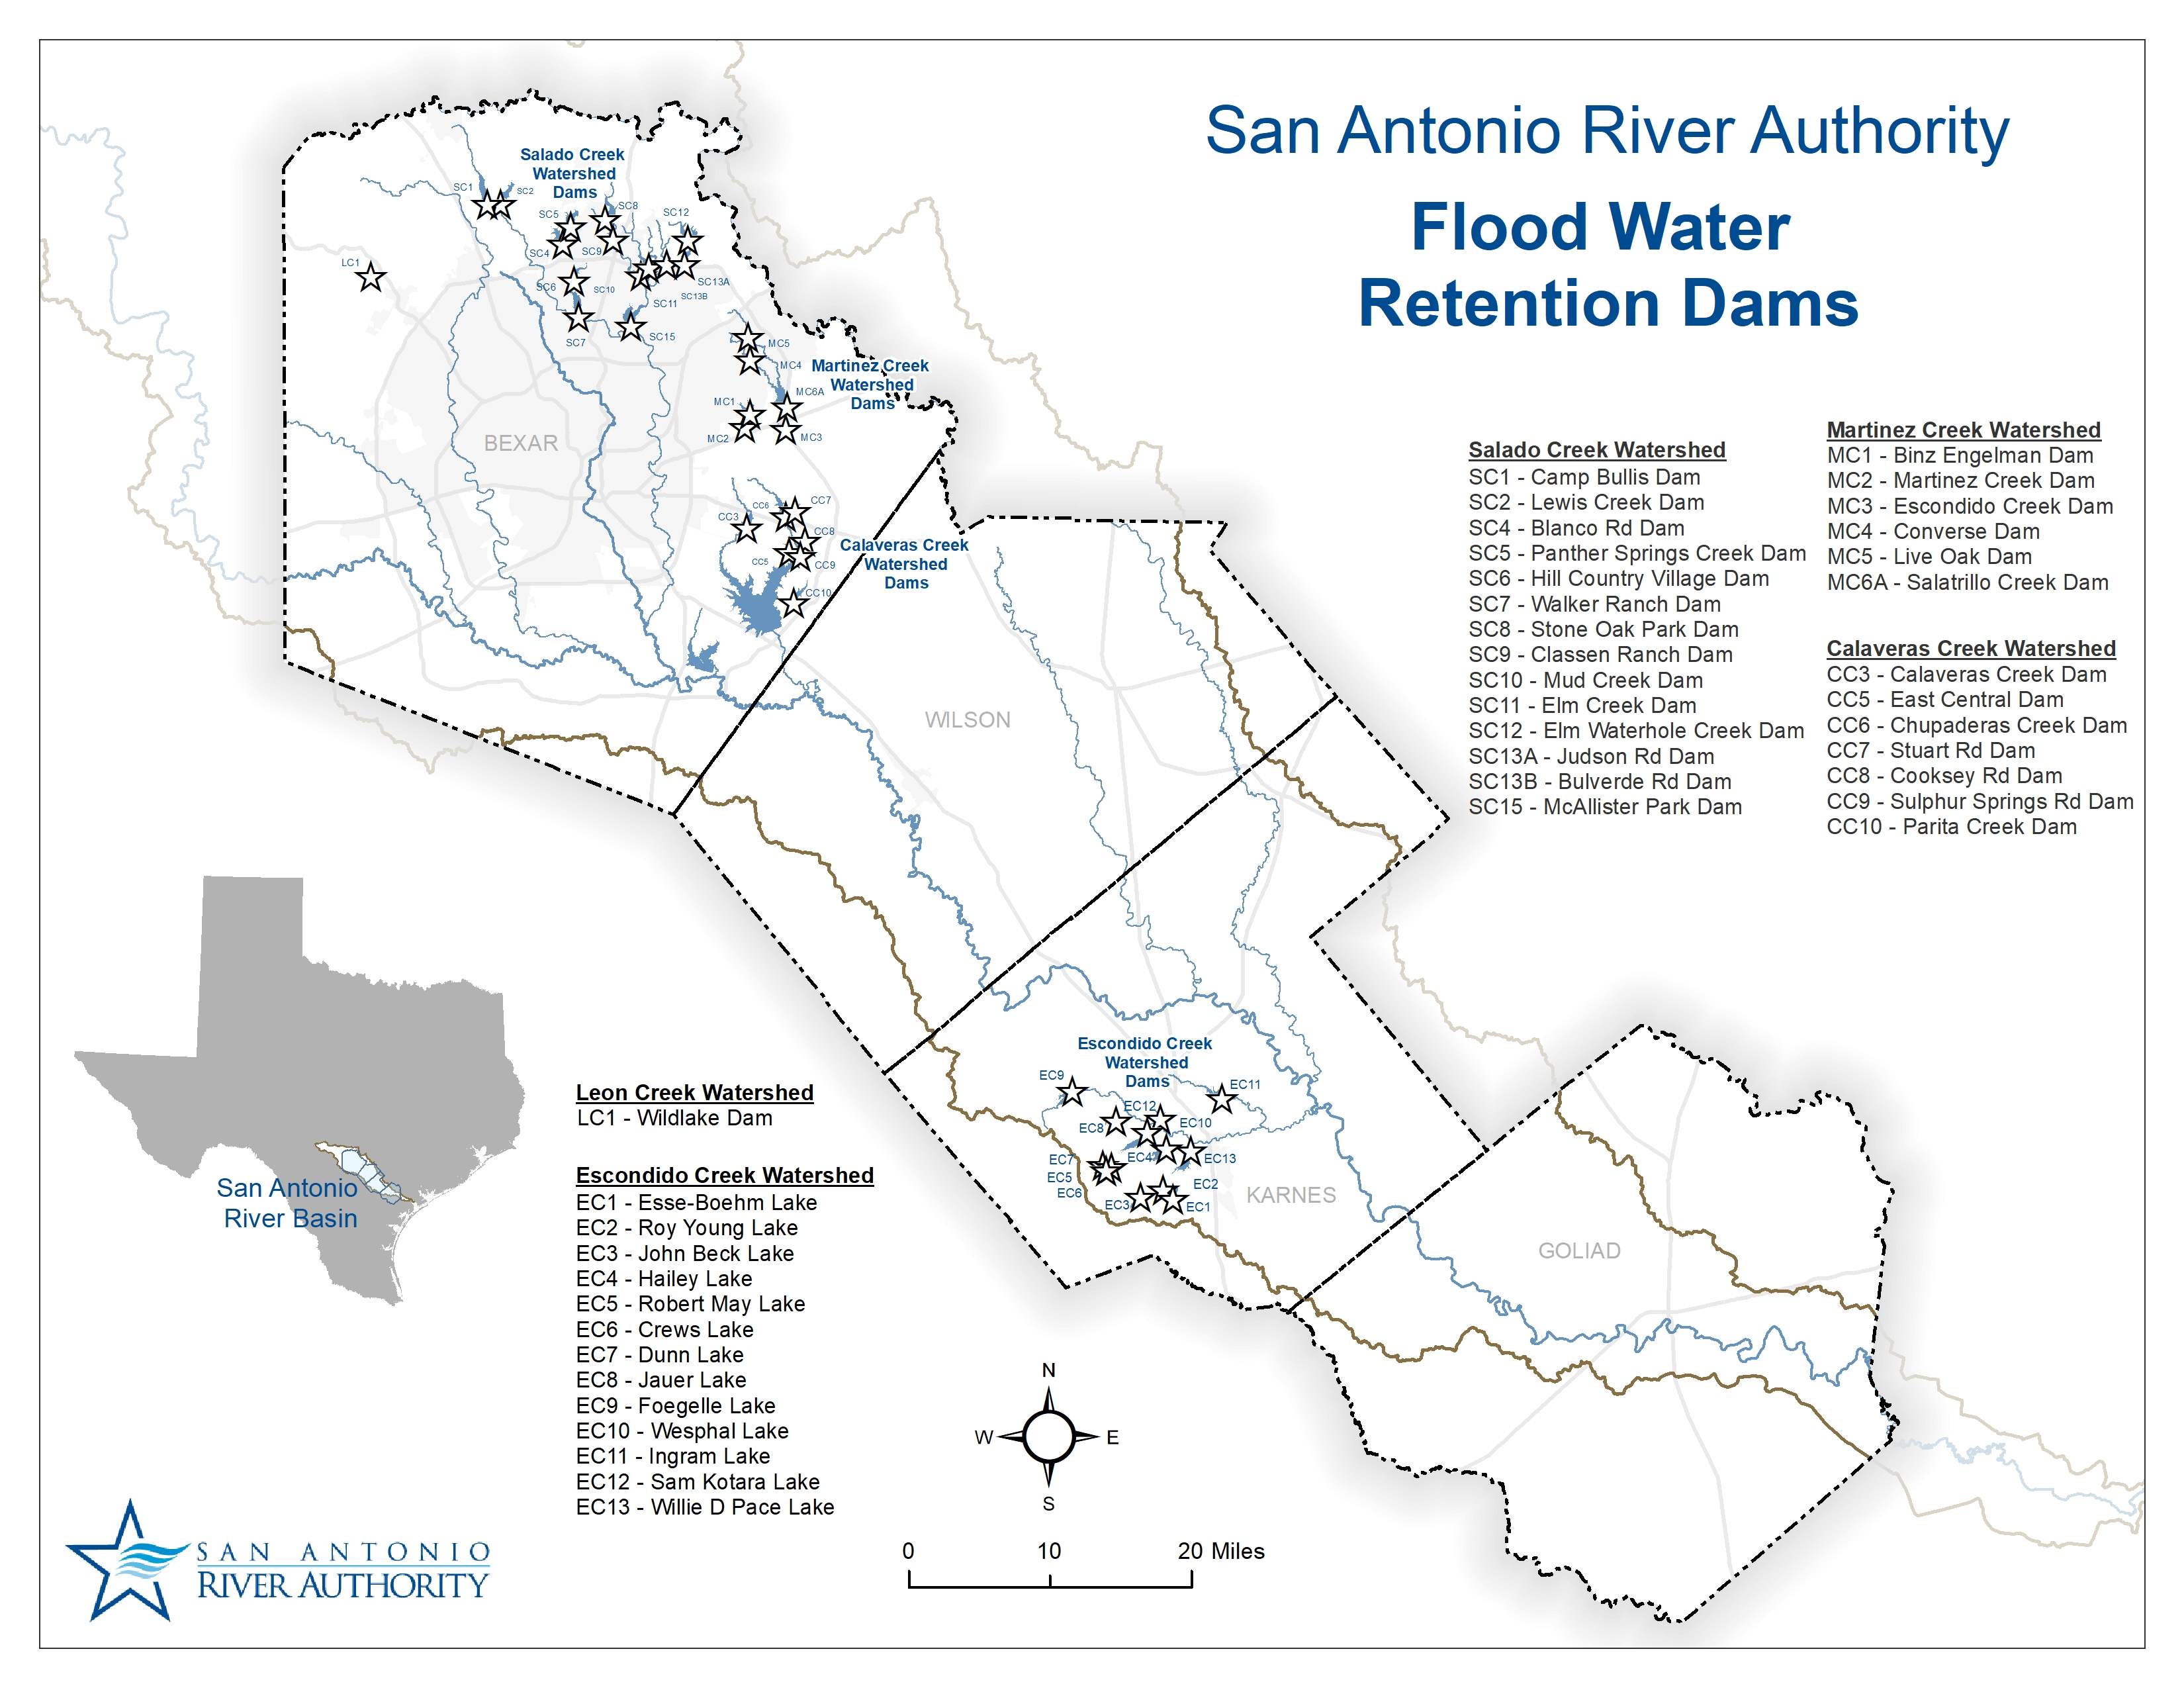 San Antonio River Authority Flood Water Retention Dams